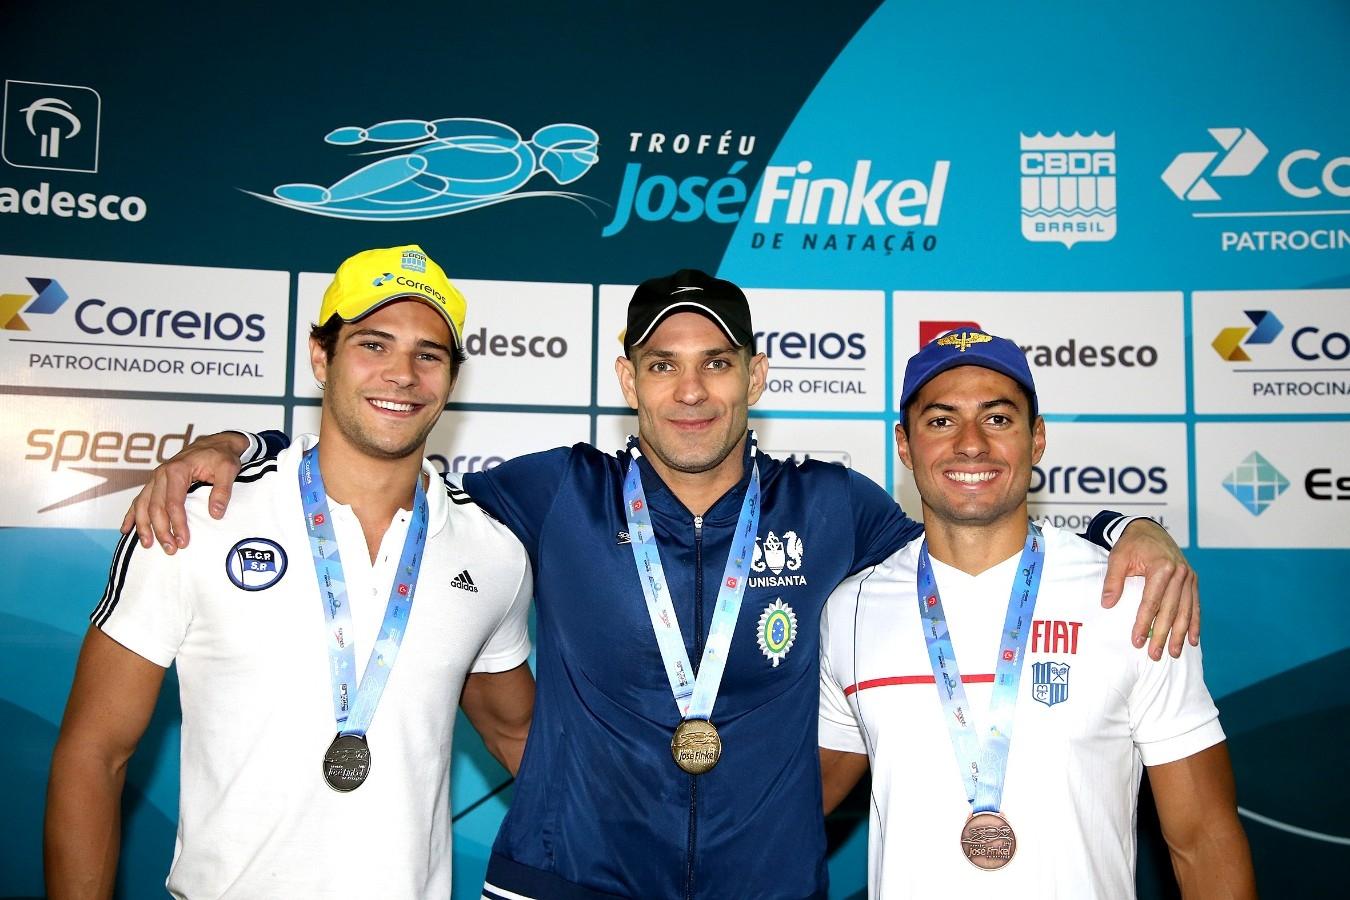 Nicholas Santos - Trofeu Jose Finkel de Natacao no Clube Internacional de Regatas. 14 de Setembro de 2016, Santos, SP, Brasil. Foto:Satiro Sodré/SSPress.